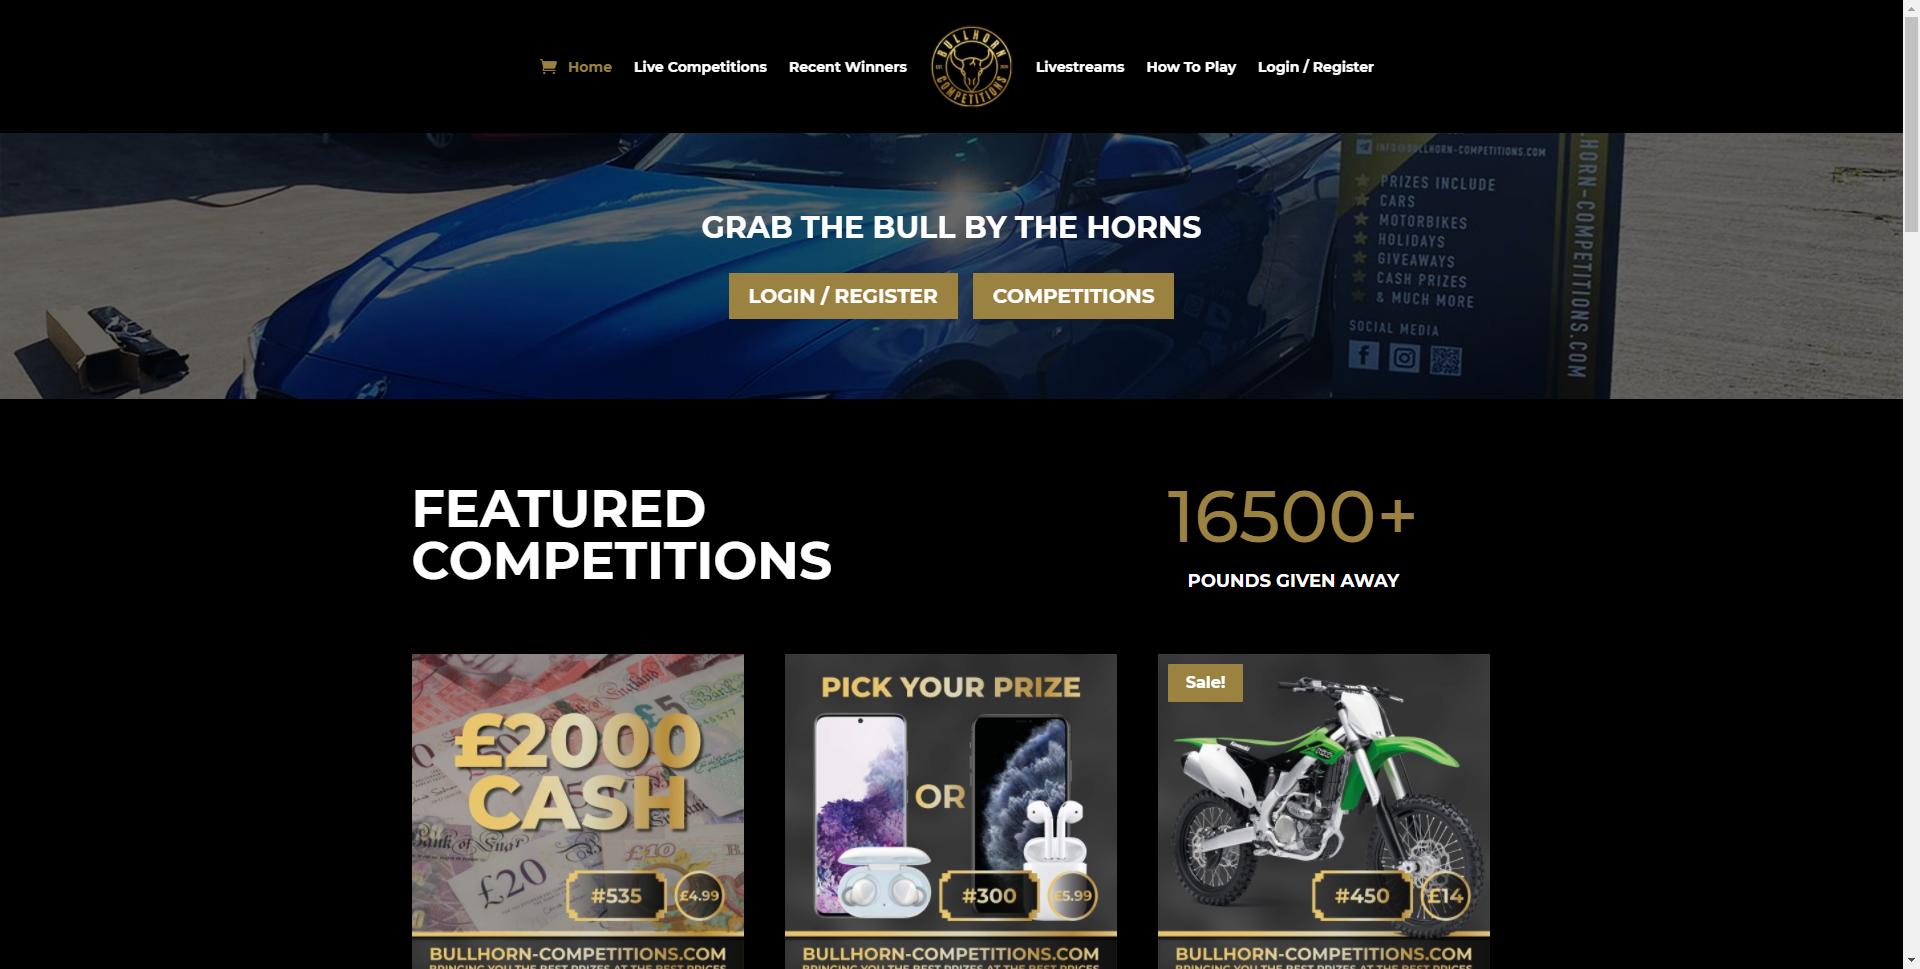 bullhorn competitions.com Websites